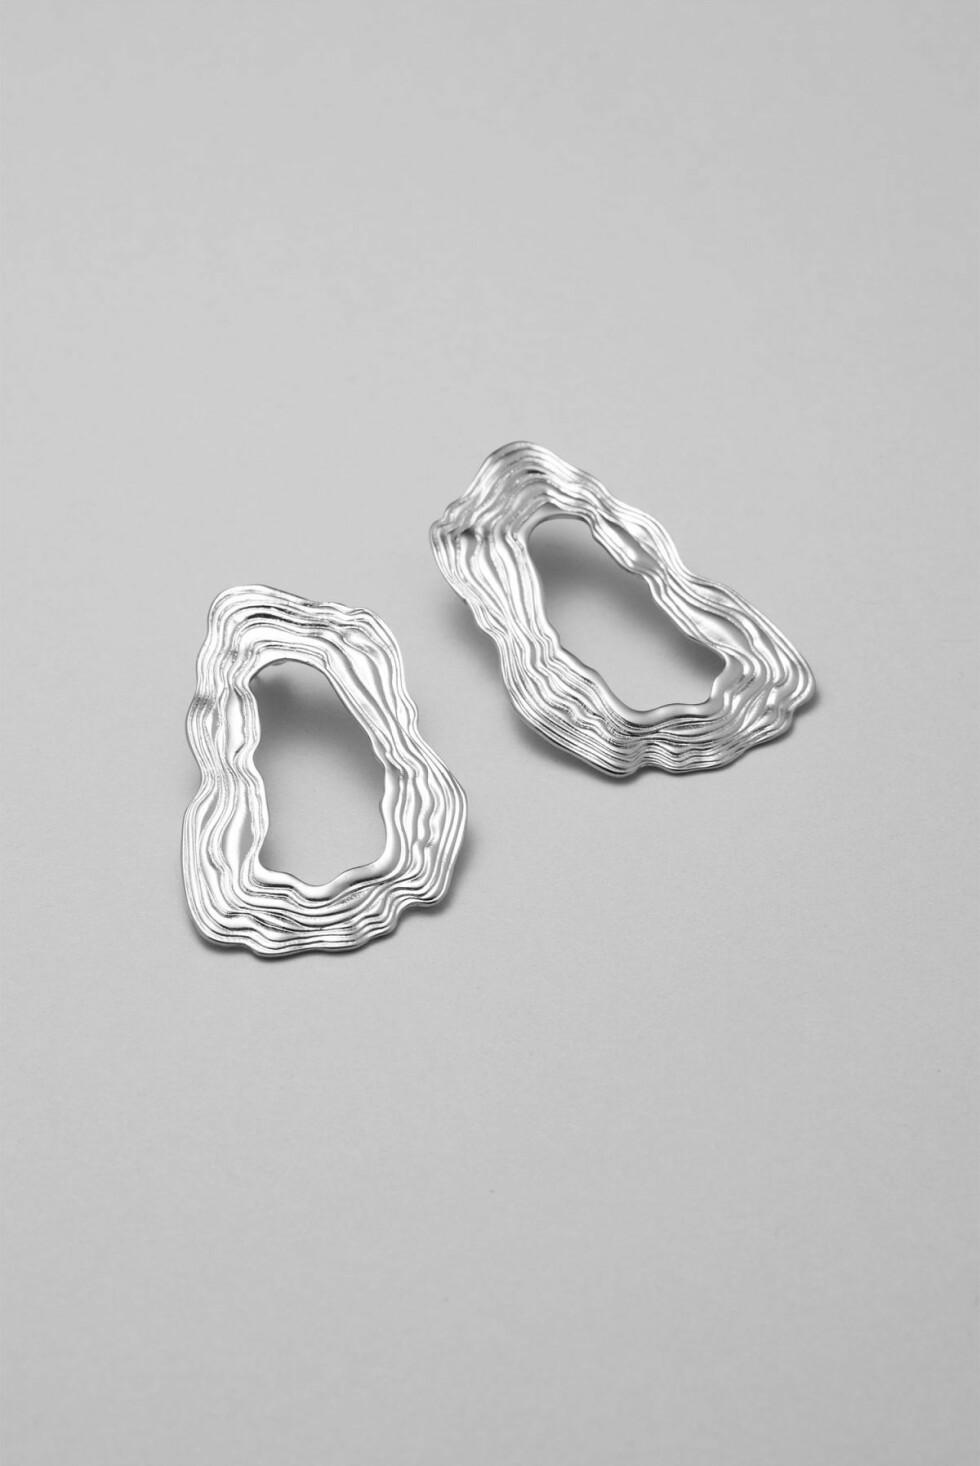 Øredobber fra Weekday |100,-| https://www.weekday.com/en_sek/women/accessories/product.chip-earrings-silver.0638422002.html